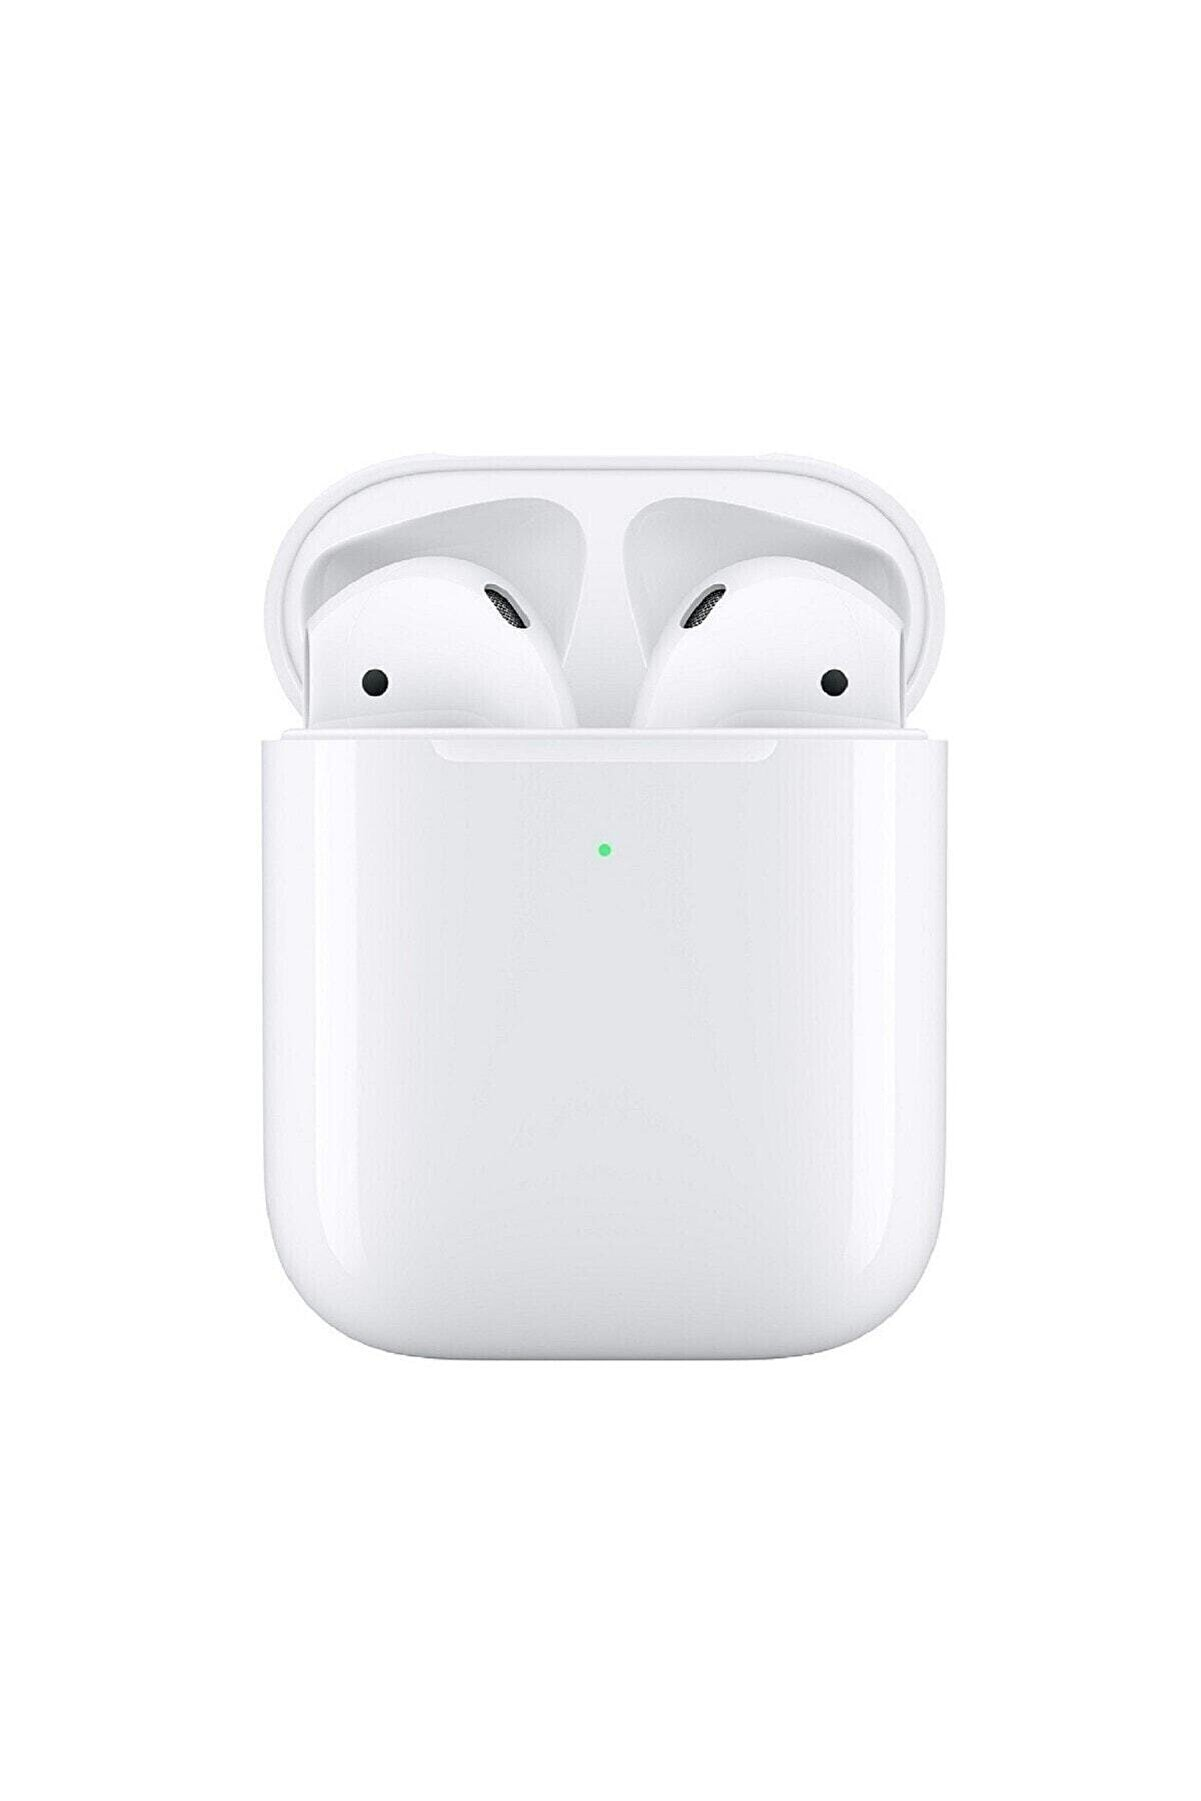 RUKUSHE Airpods 2. Nesil Uyumlu Bluetooth Kulaklık Tüm Telefonlara Uyumlu-dokunmatik- Logolu Seri Nolu